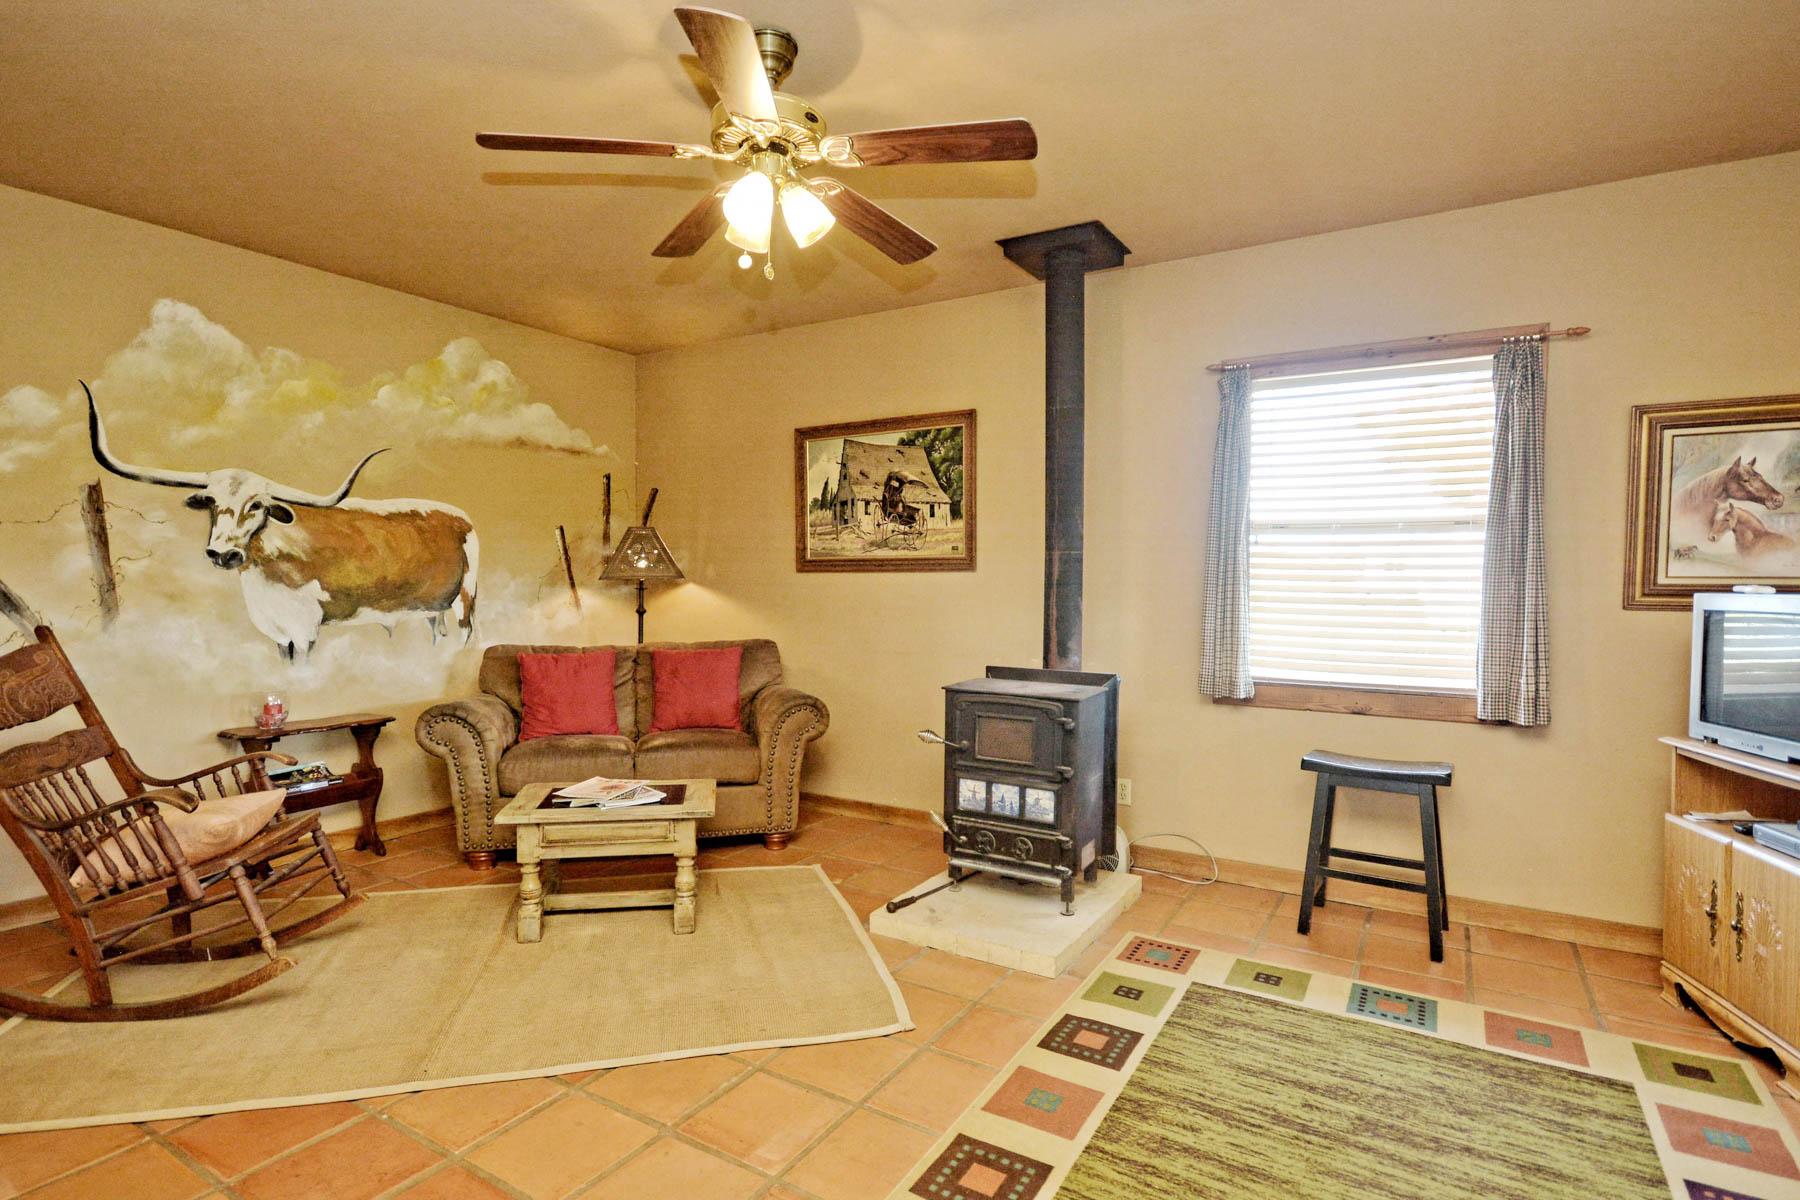 Additional photo for property listing at Amazing Fredericksburg Property on 36-/+ Acres 457 Bob Moritz Fredericksburg, Texas 78624 Estados Unidos